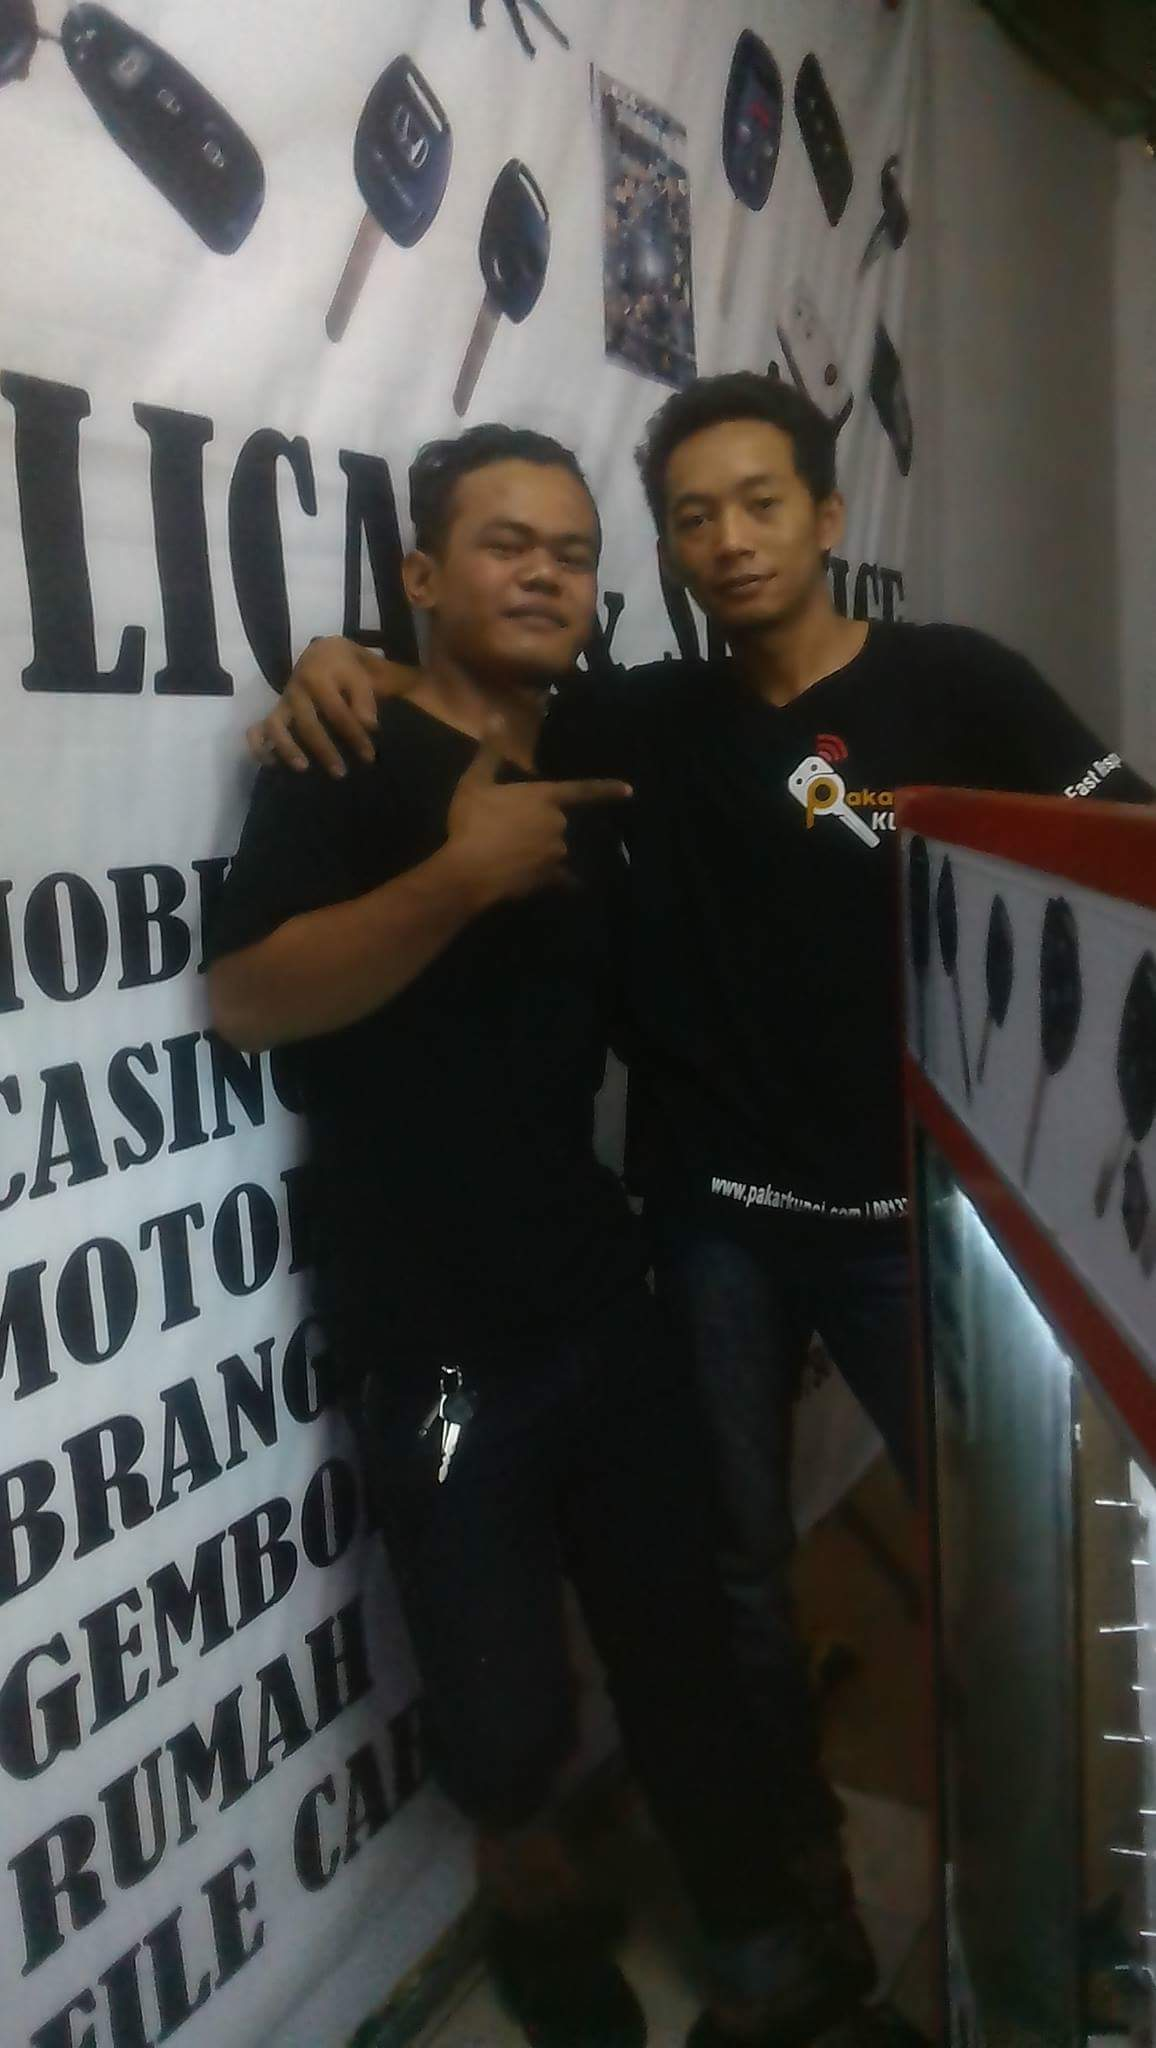 Ahli duplicat kunci mobil immobilizer Pasuruan Jawa timur Indonesia